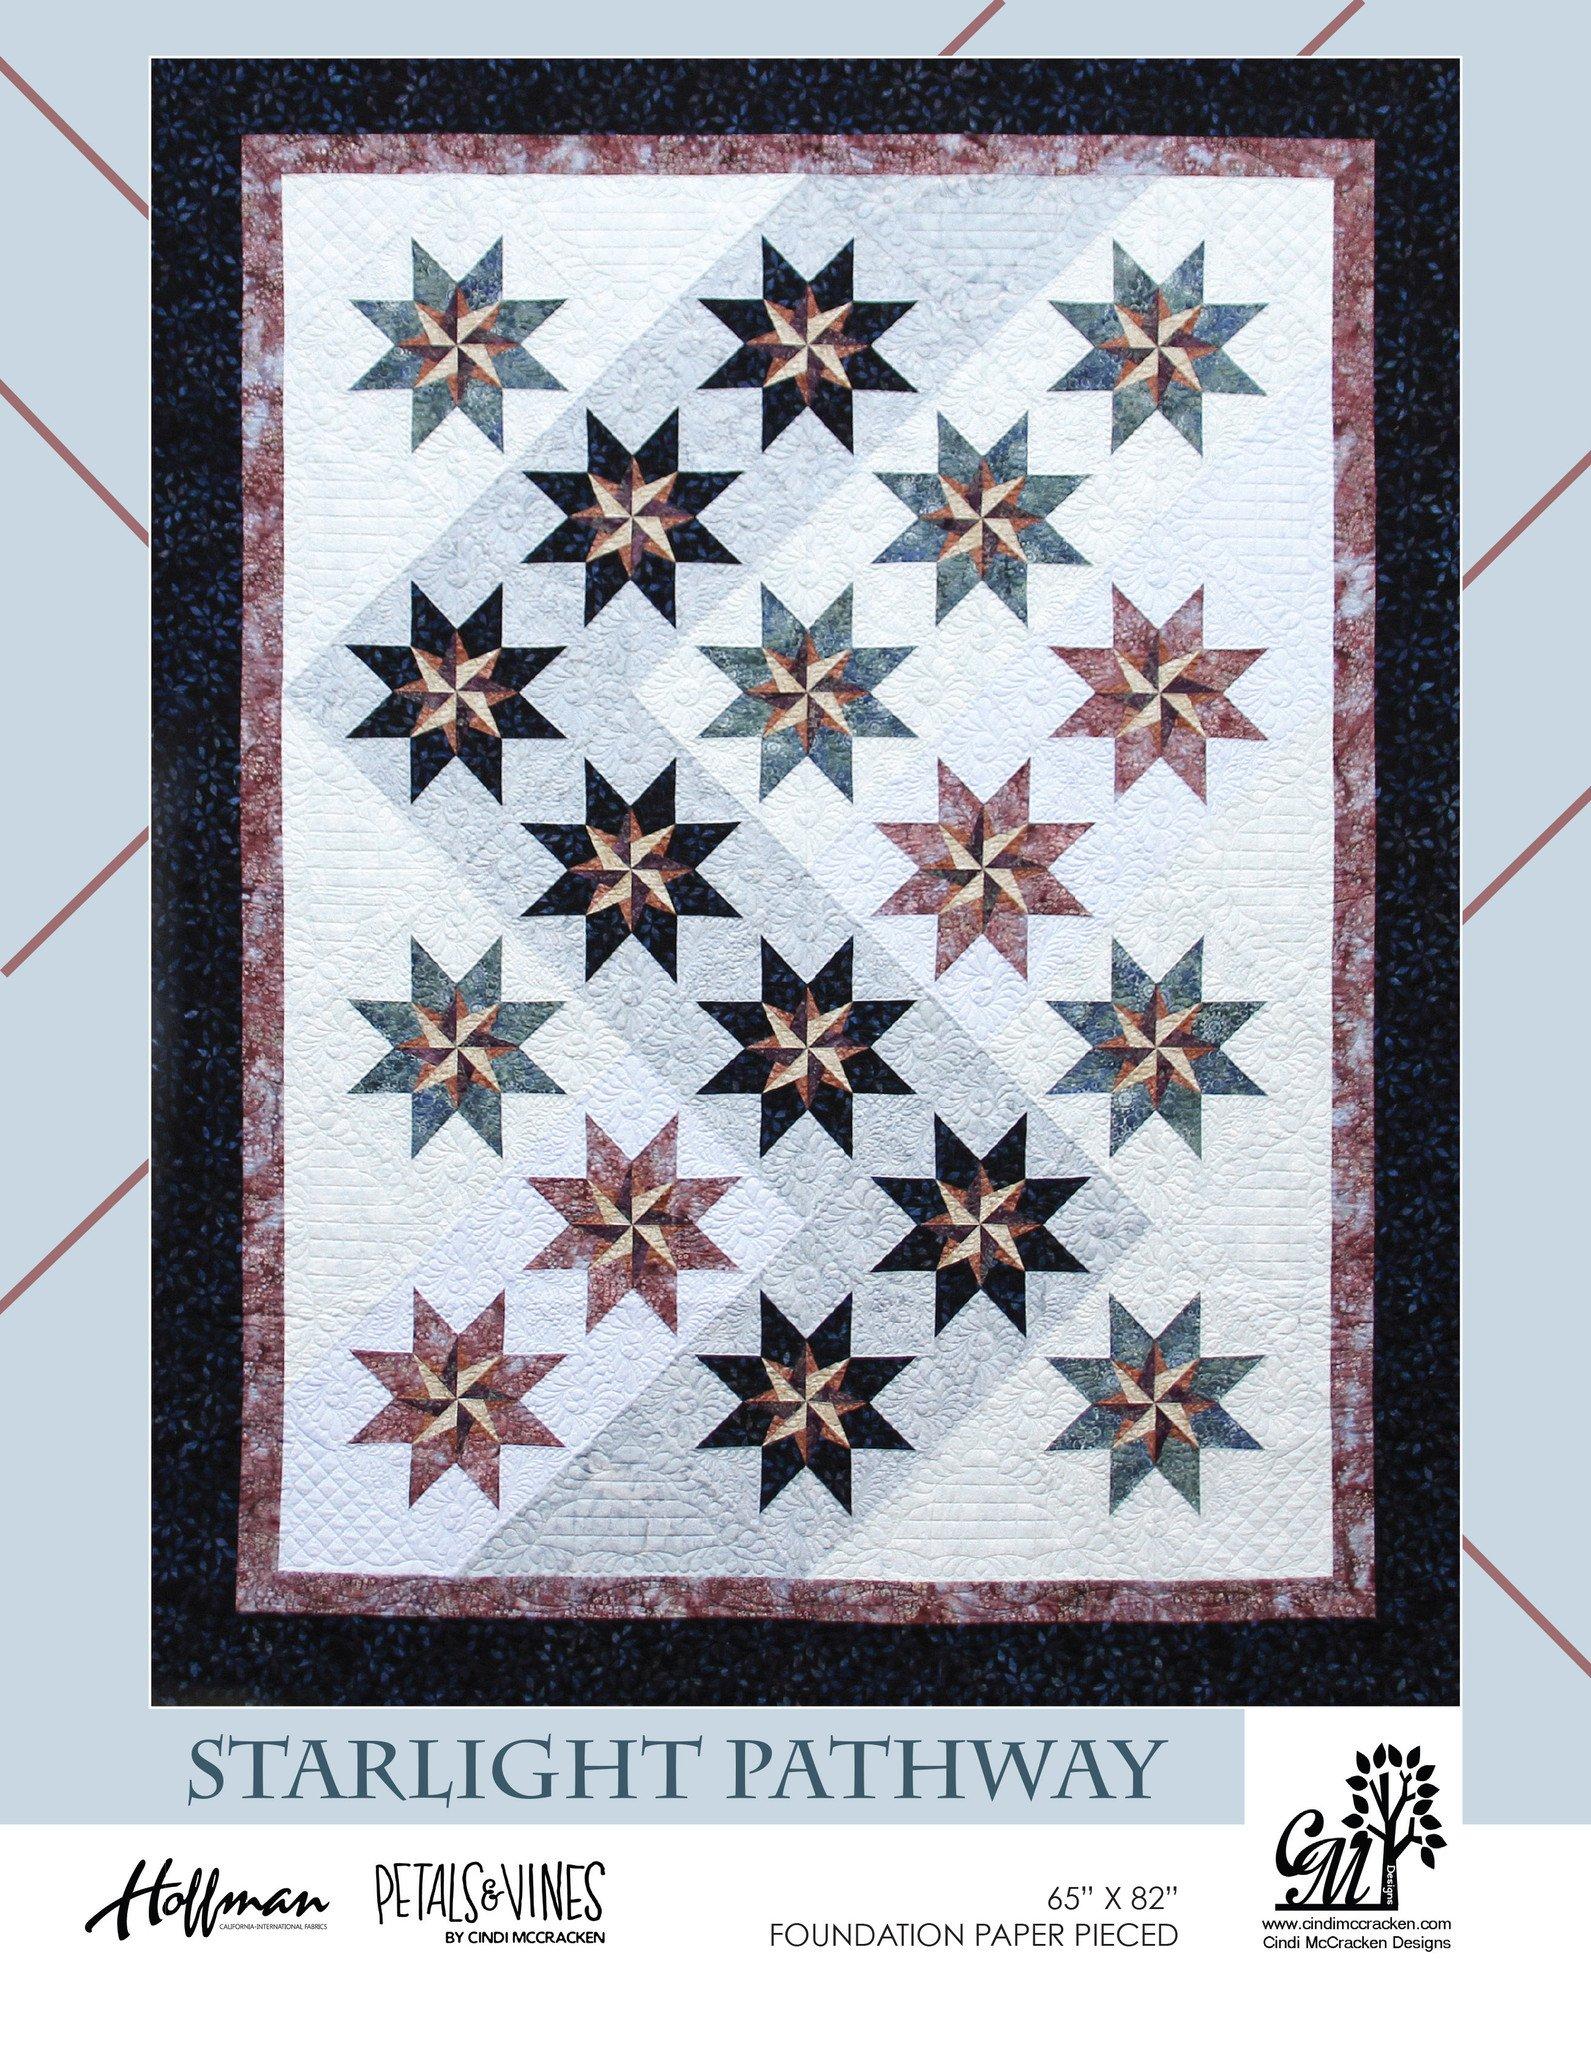 Starlight Pathway 65 x 82